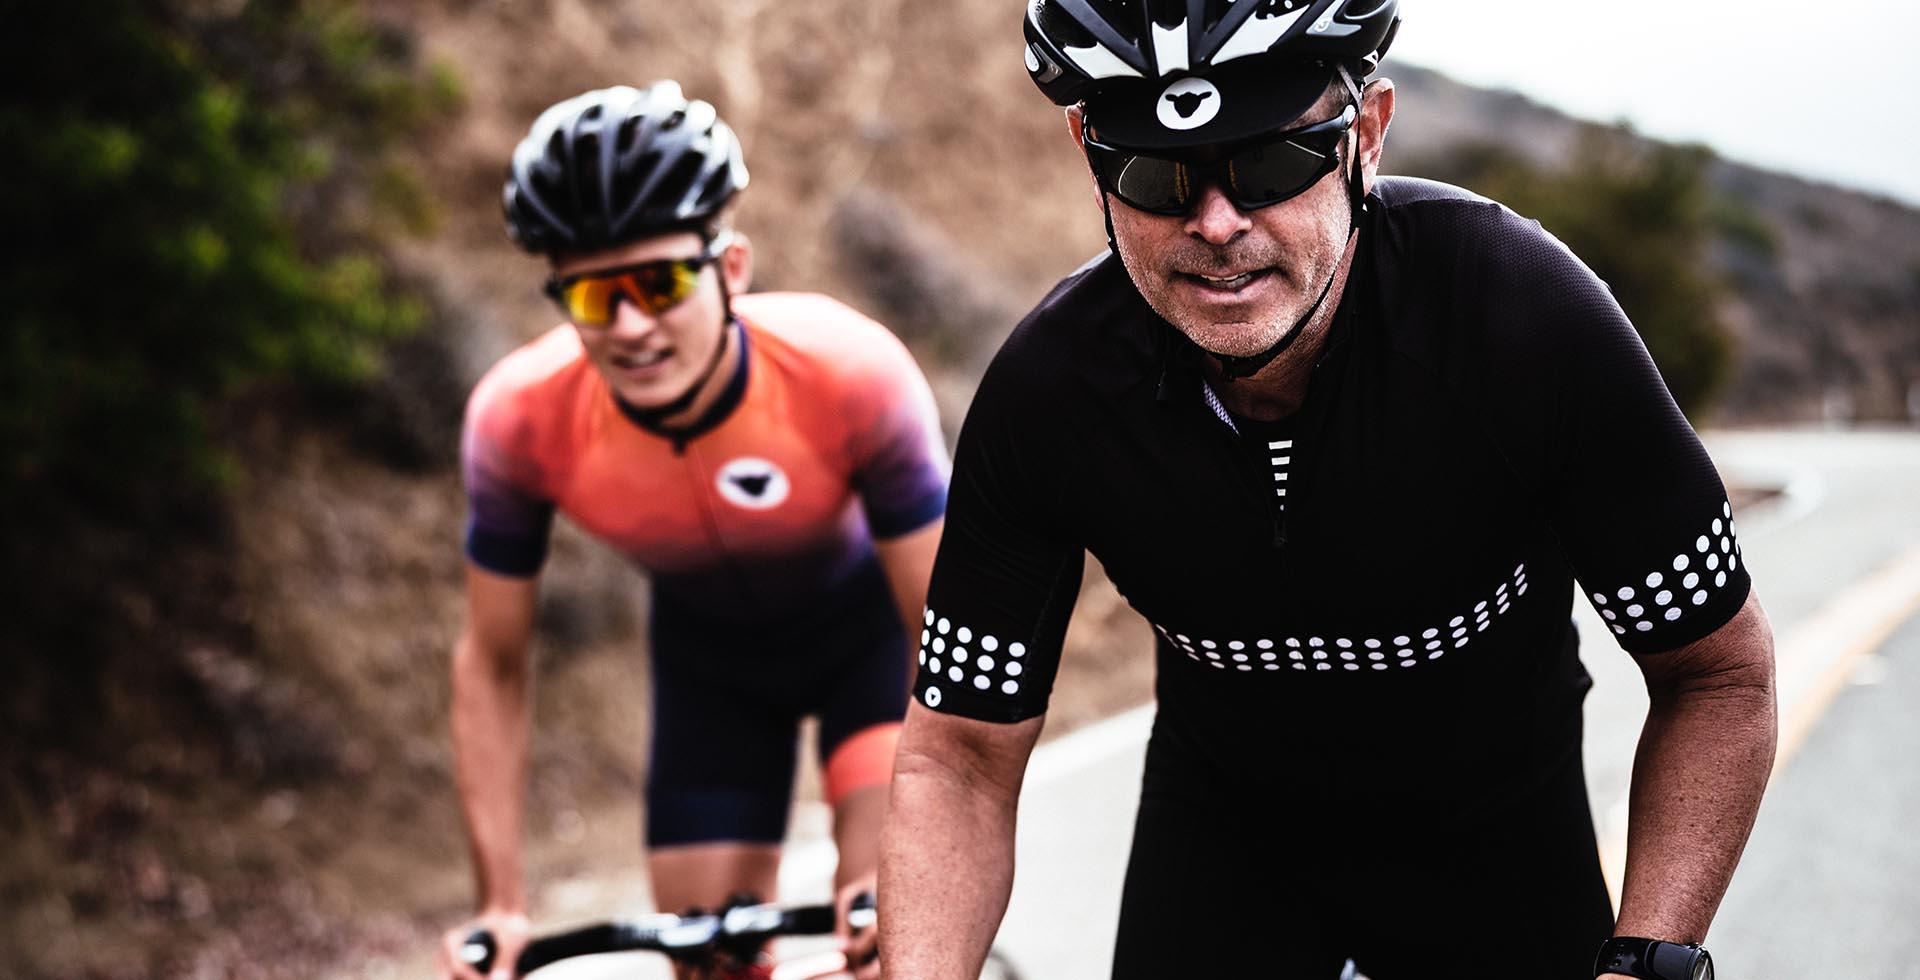 Man Ride Documentary